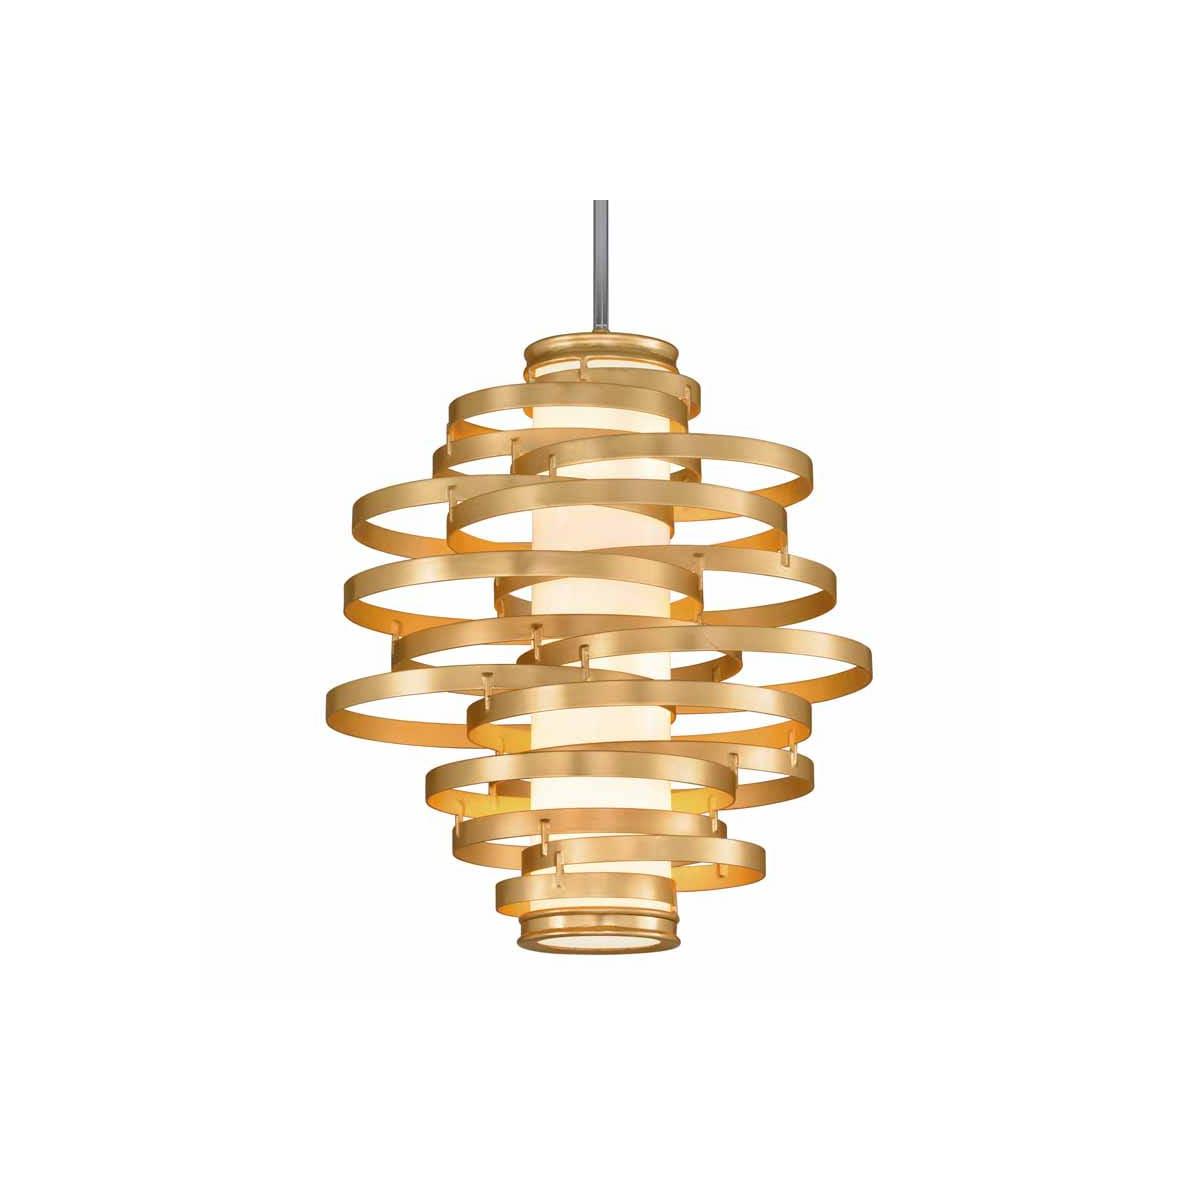 Corbett Lighting 225 43 Gold Leaf With